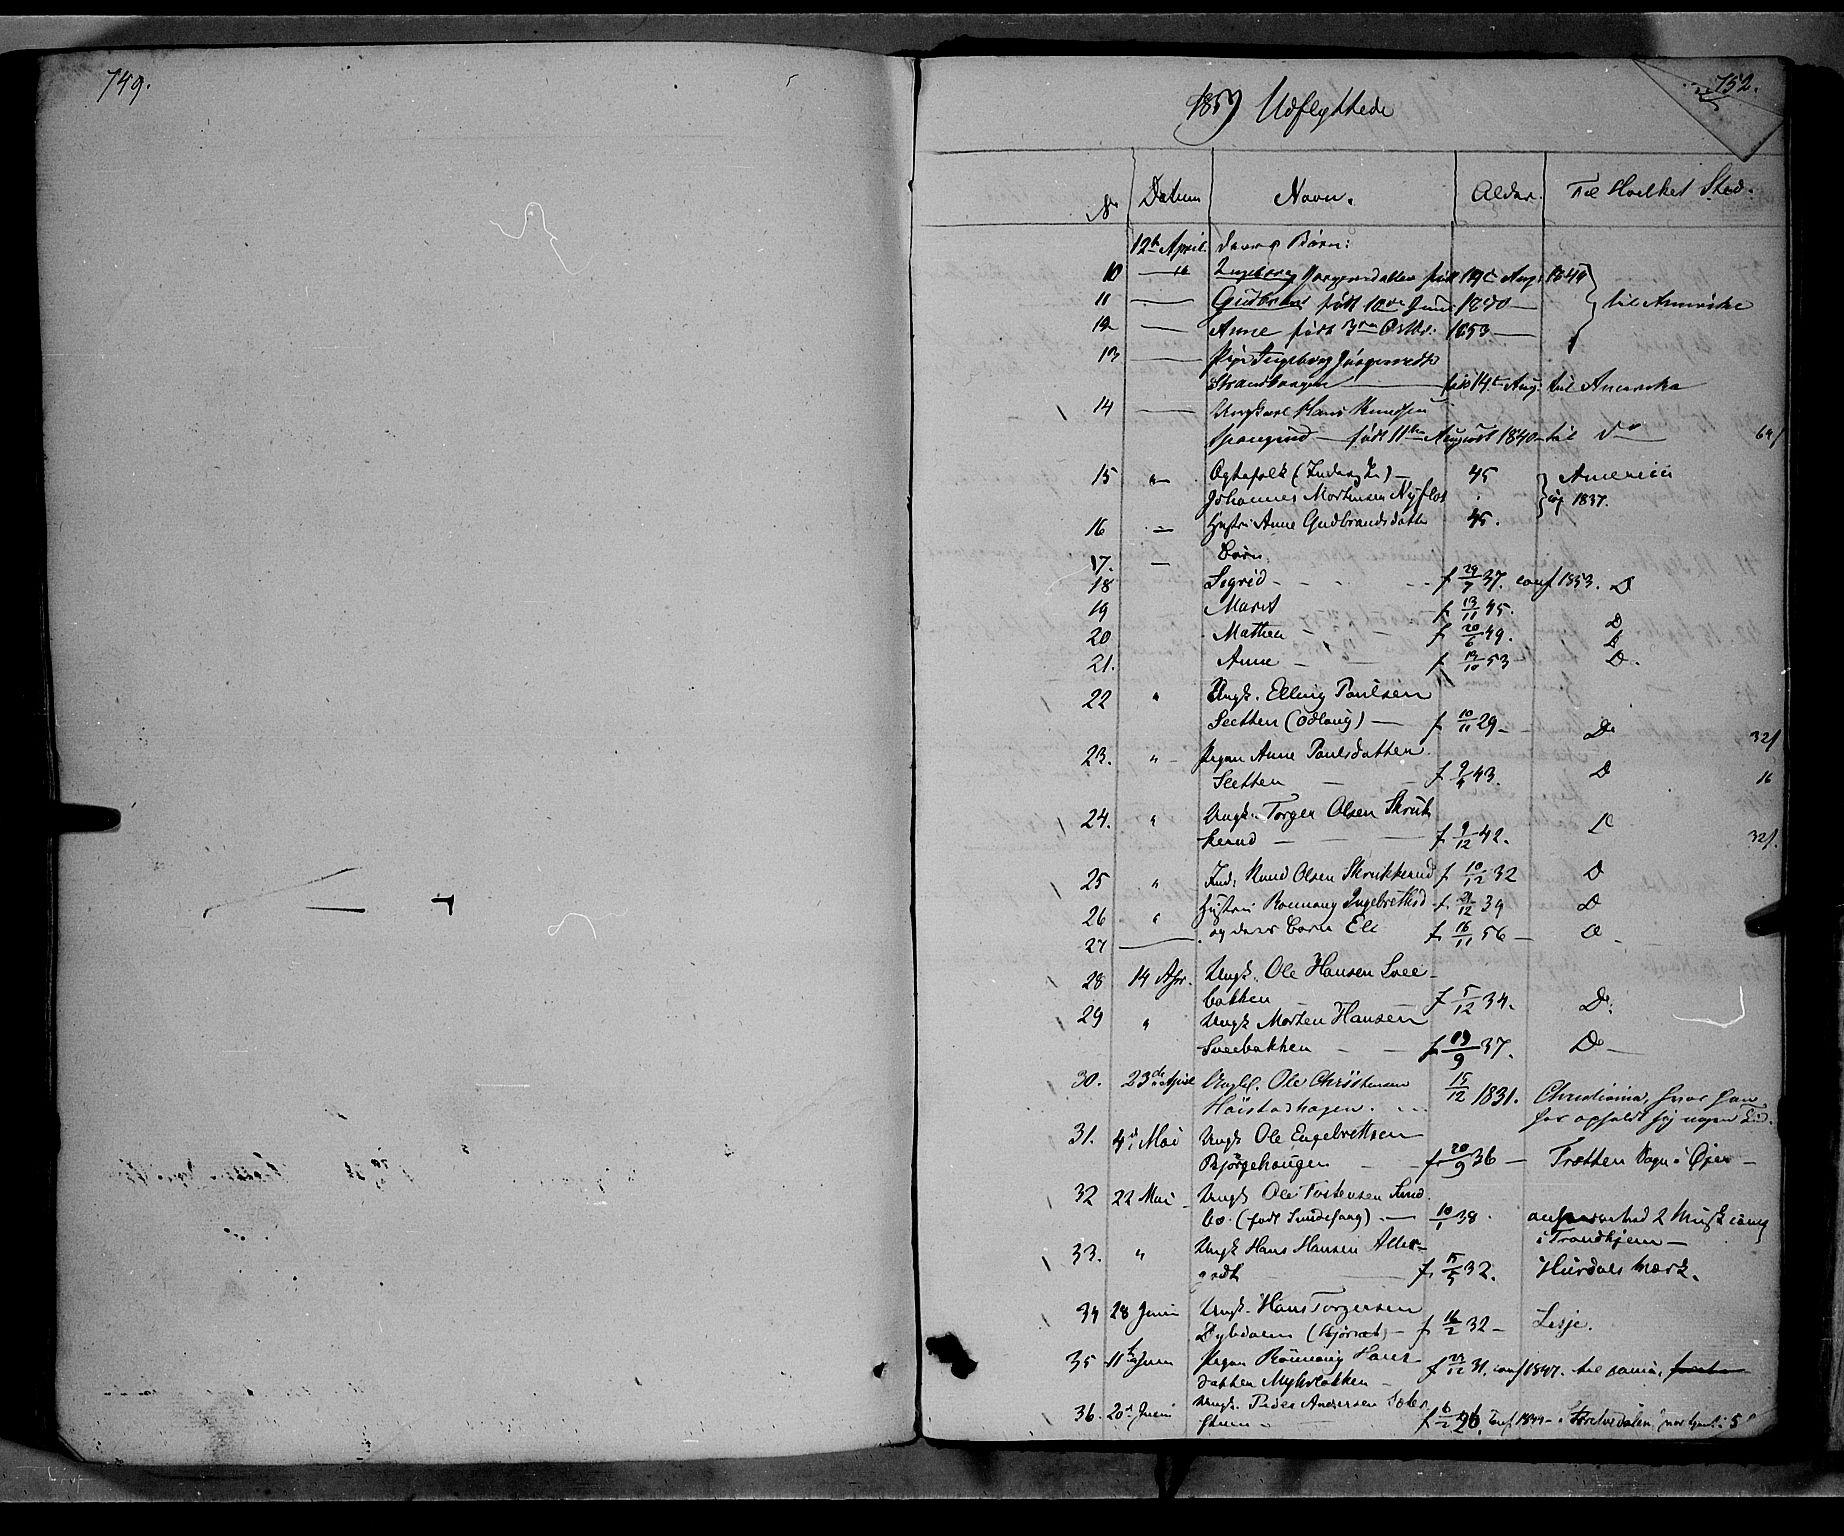 SAH, Ringebu prestekontor, Ministerialbok nr. 6, 1848-1859, s. 749-750